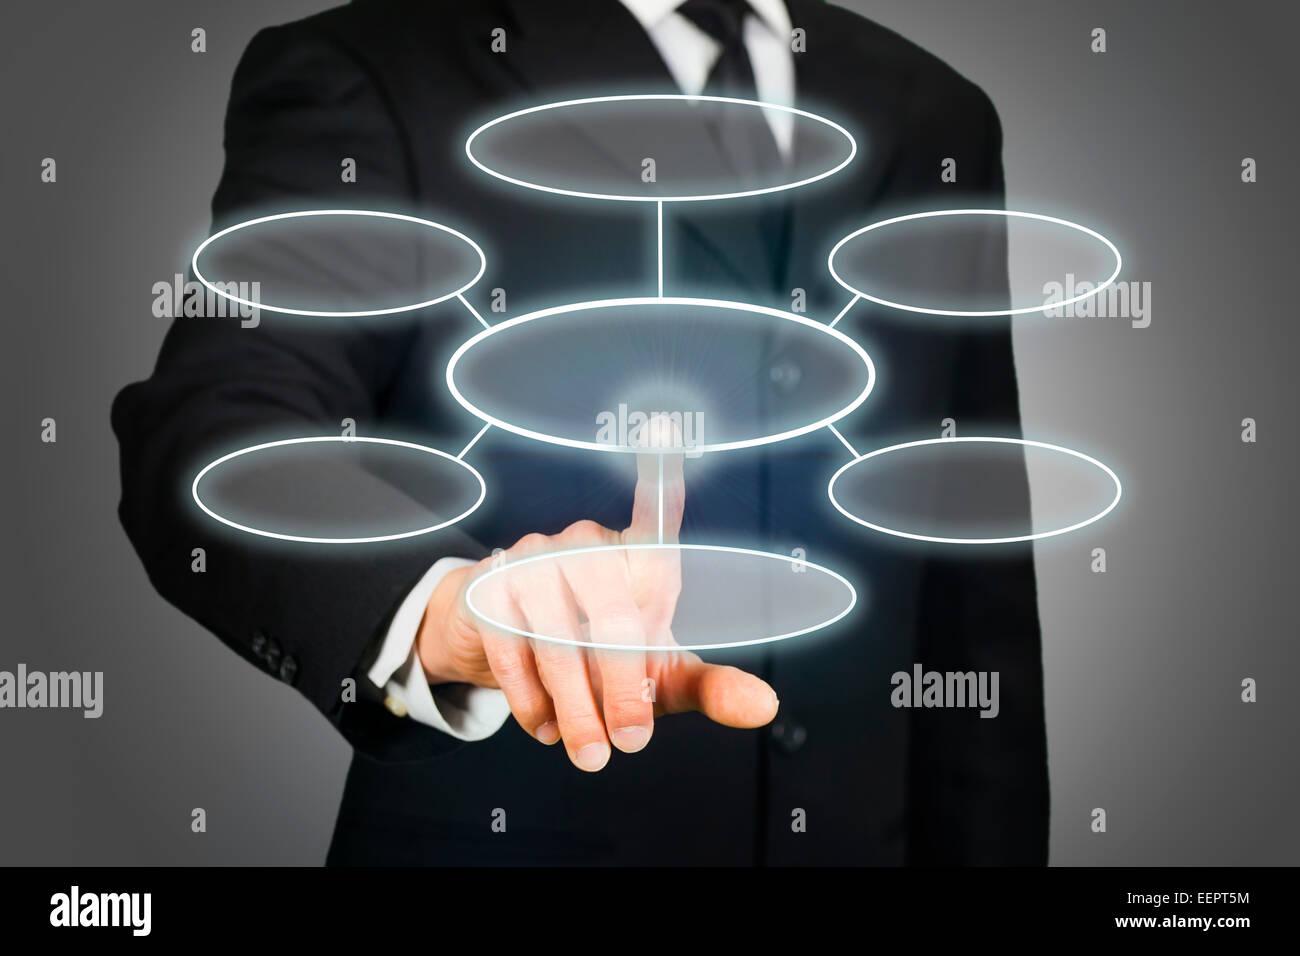 Businessman clicking flowchart on touchscreen - Stock Image